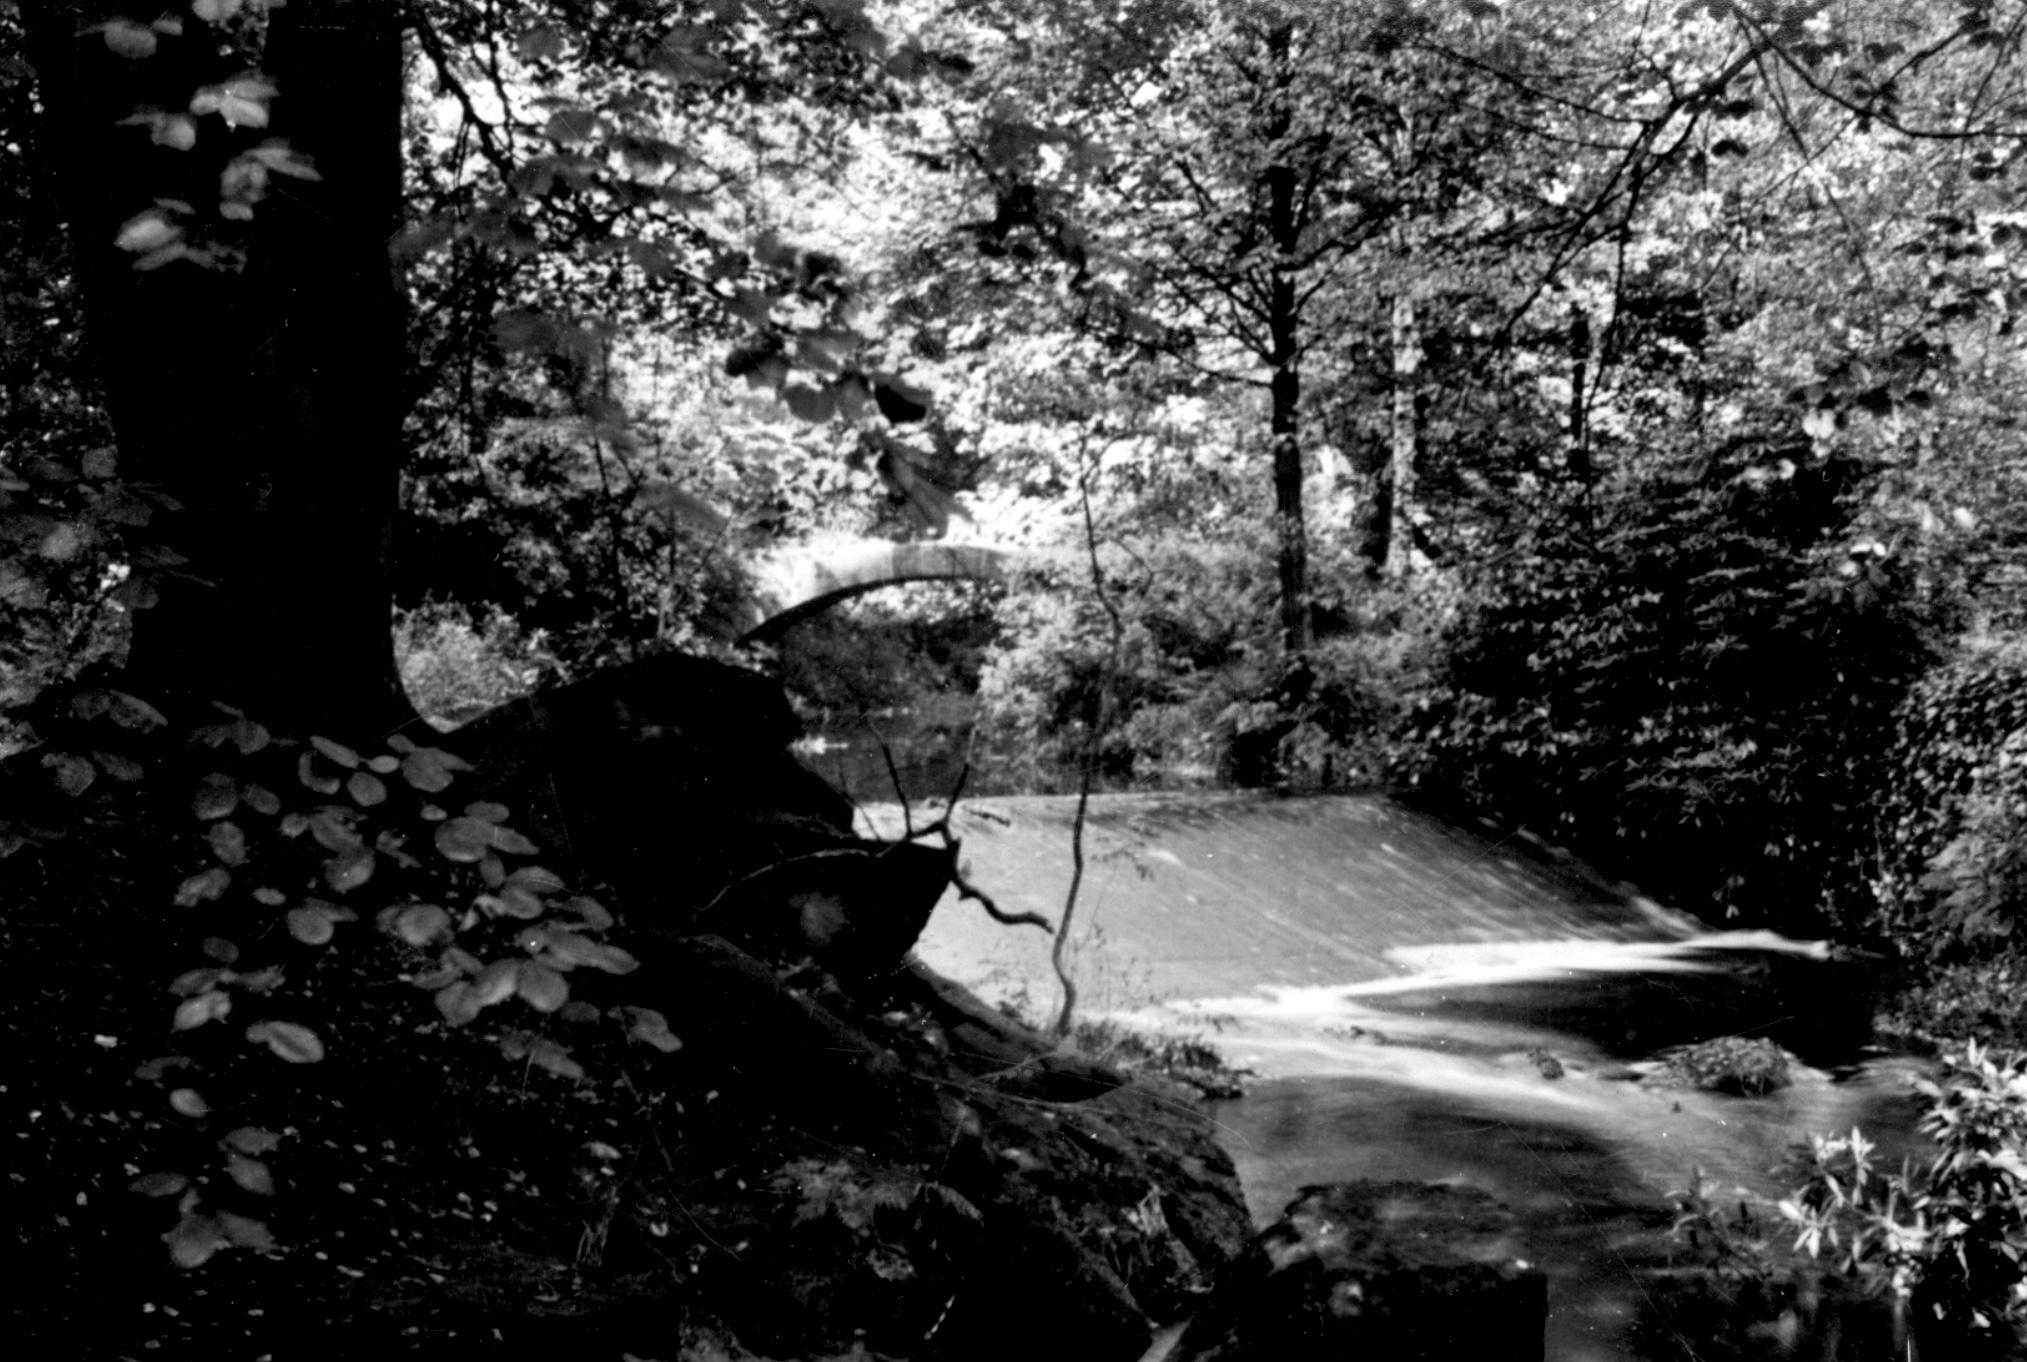 Venetian Bridge and Weir, American Garden, 1985